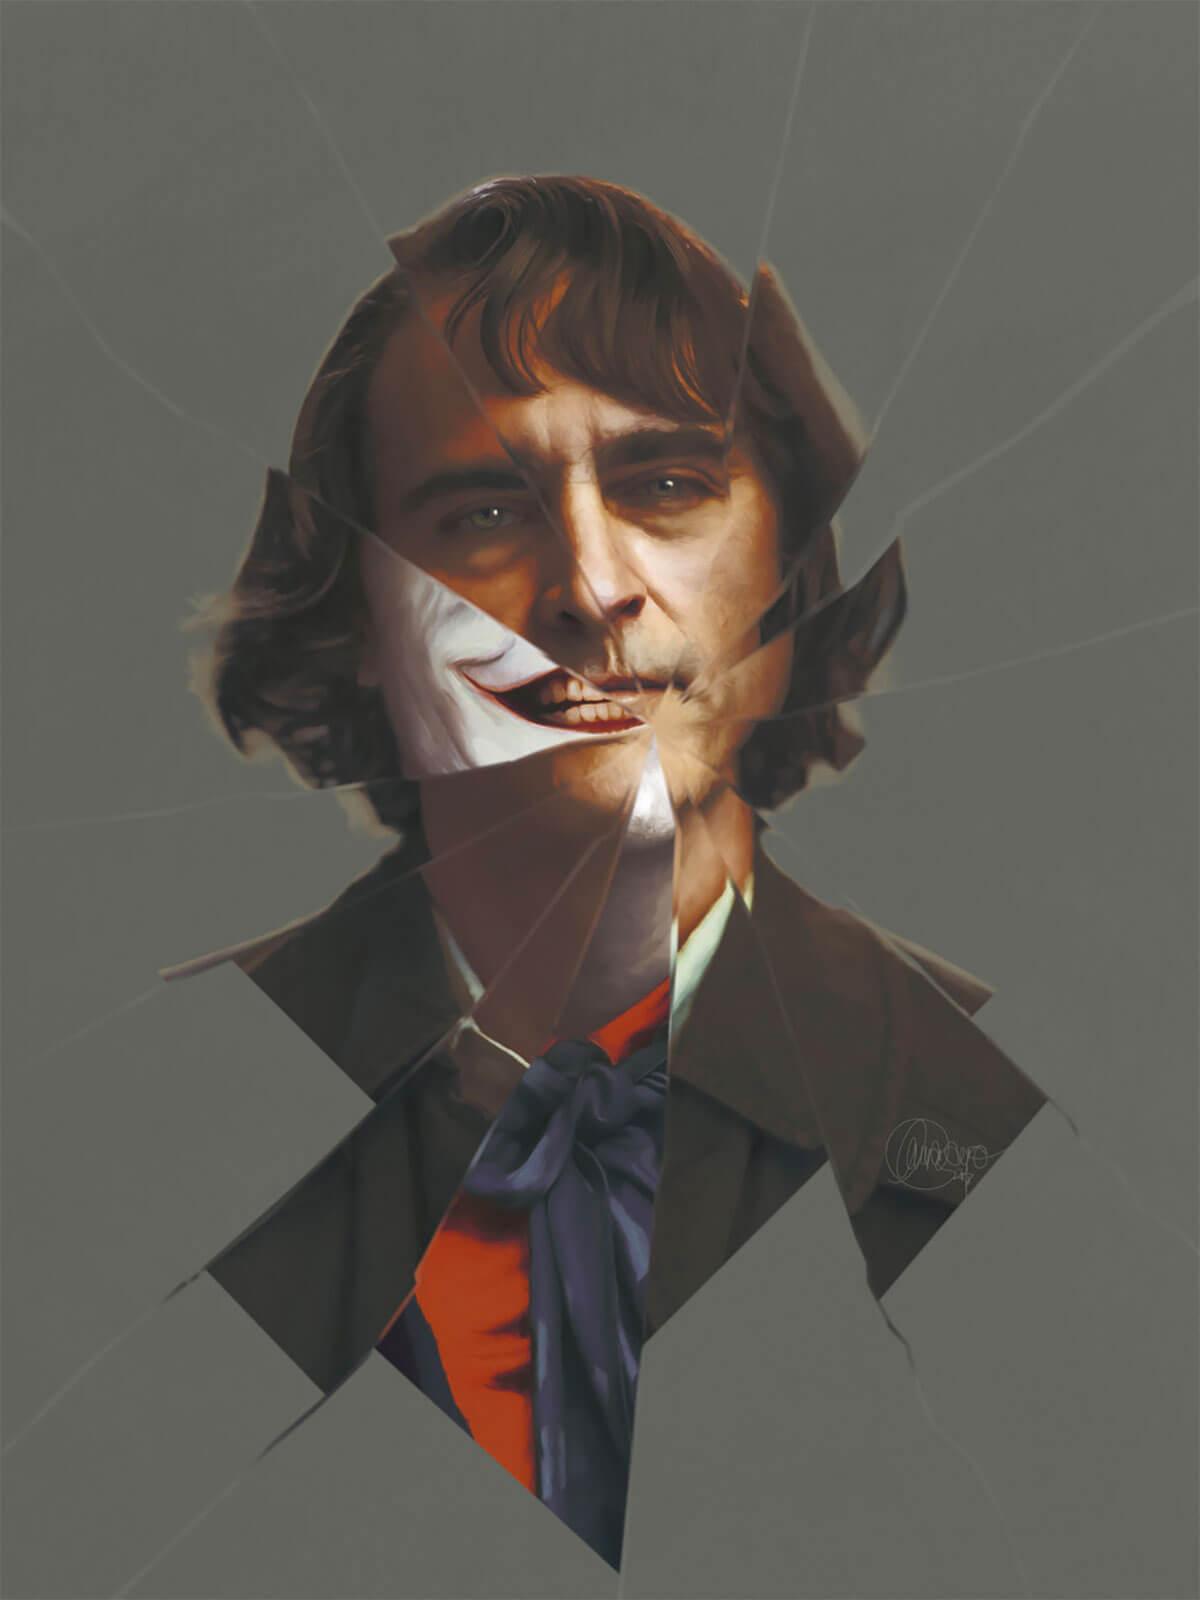 Joaquin Phoenix as The Joker by Laura Racero